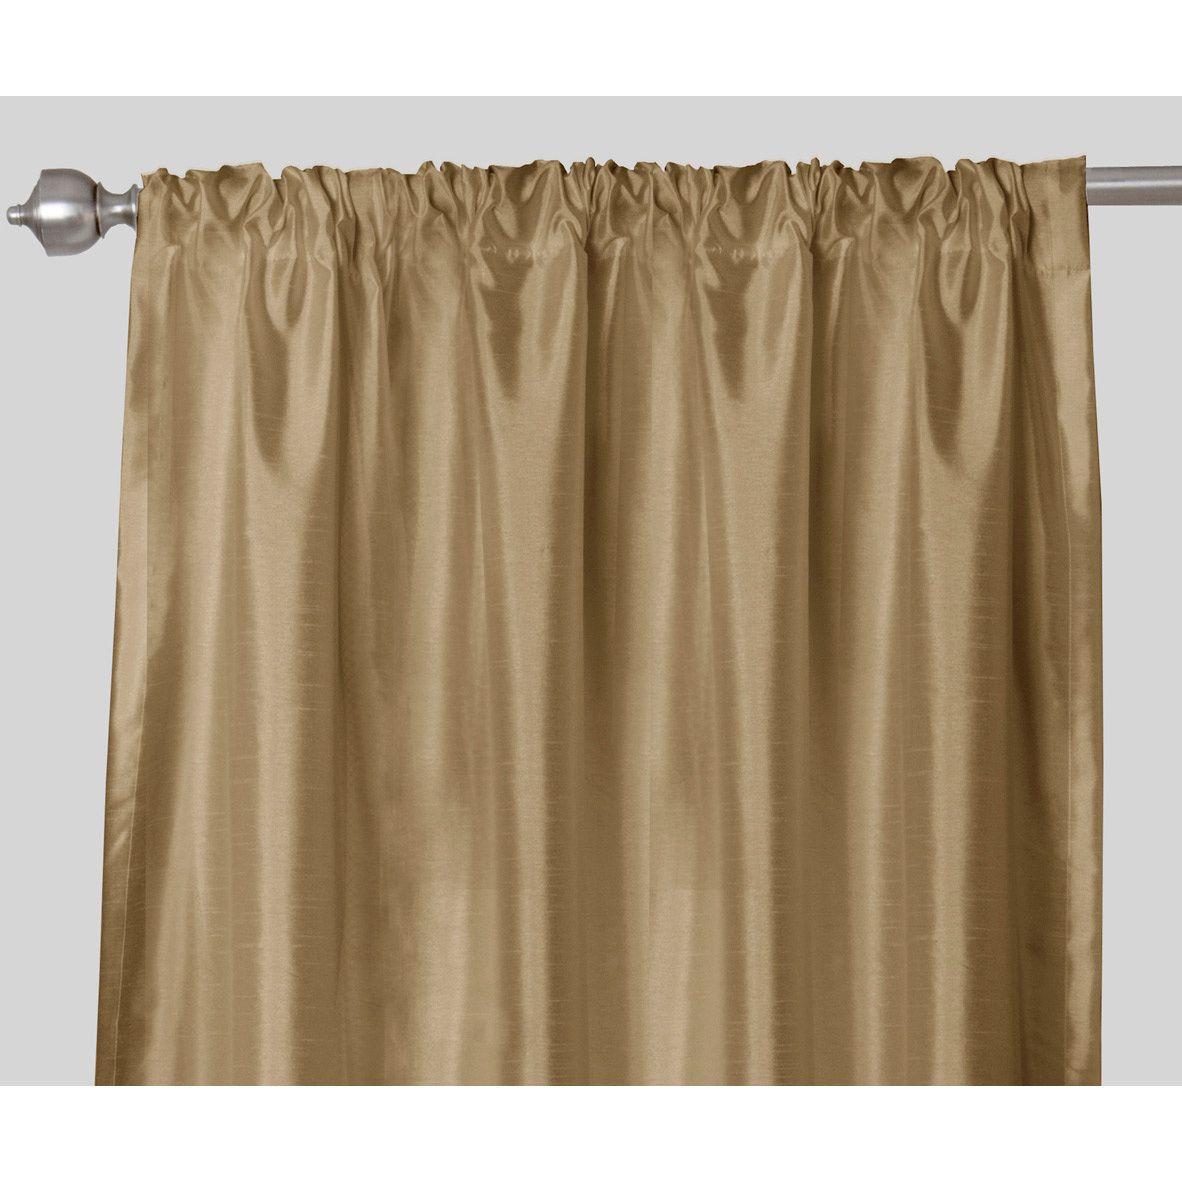 Maytex Faux Silk Rod Pocket 84 Inch Curtain Panel Pair (Plum), Purple, Size  52 X 84